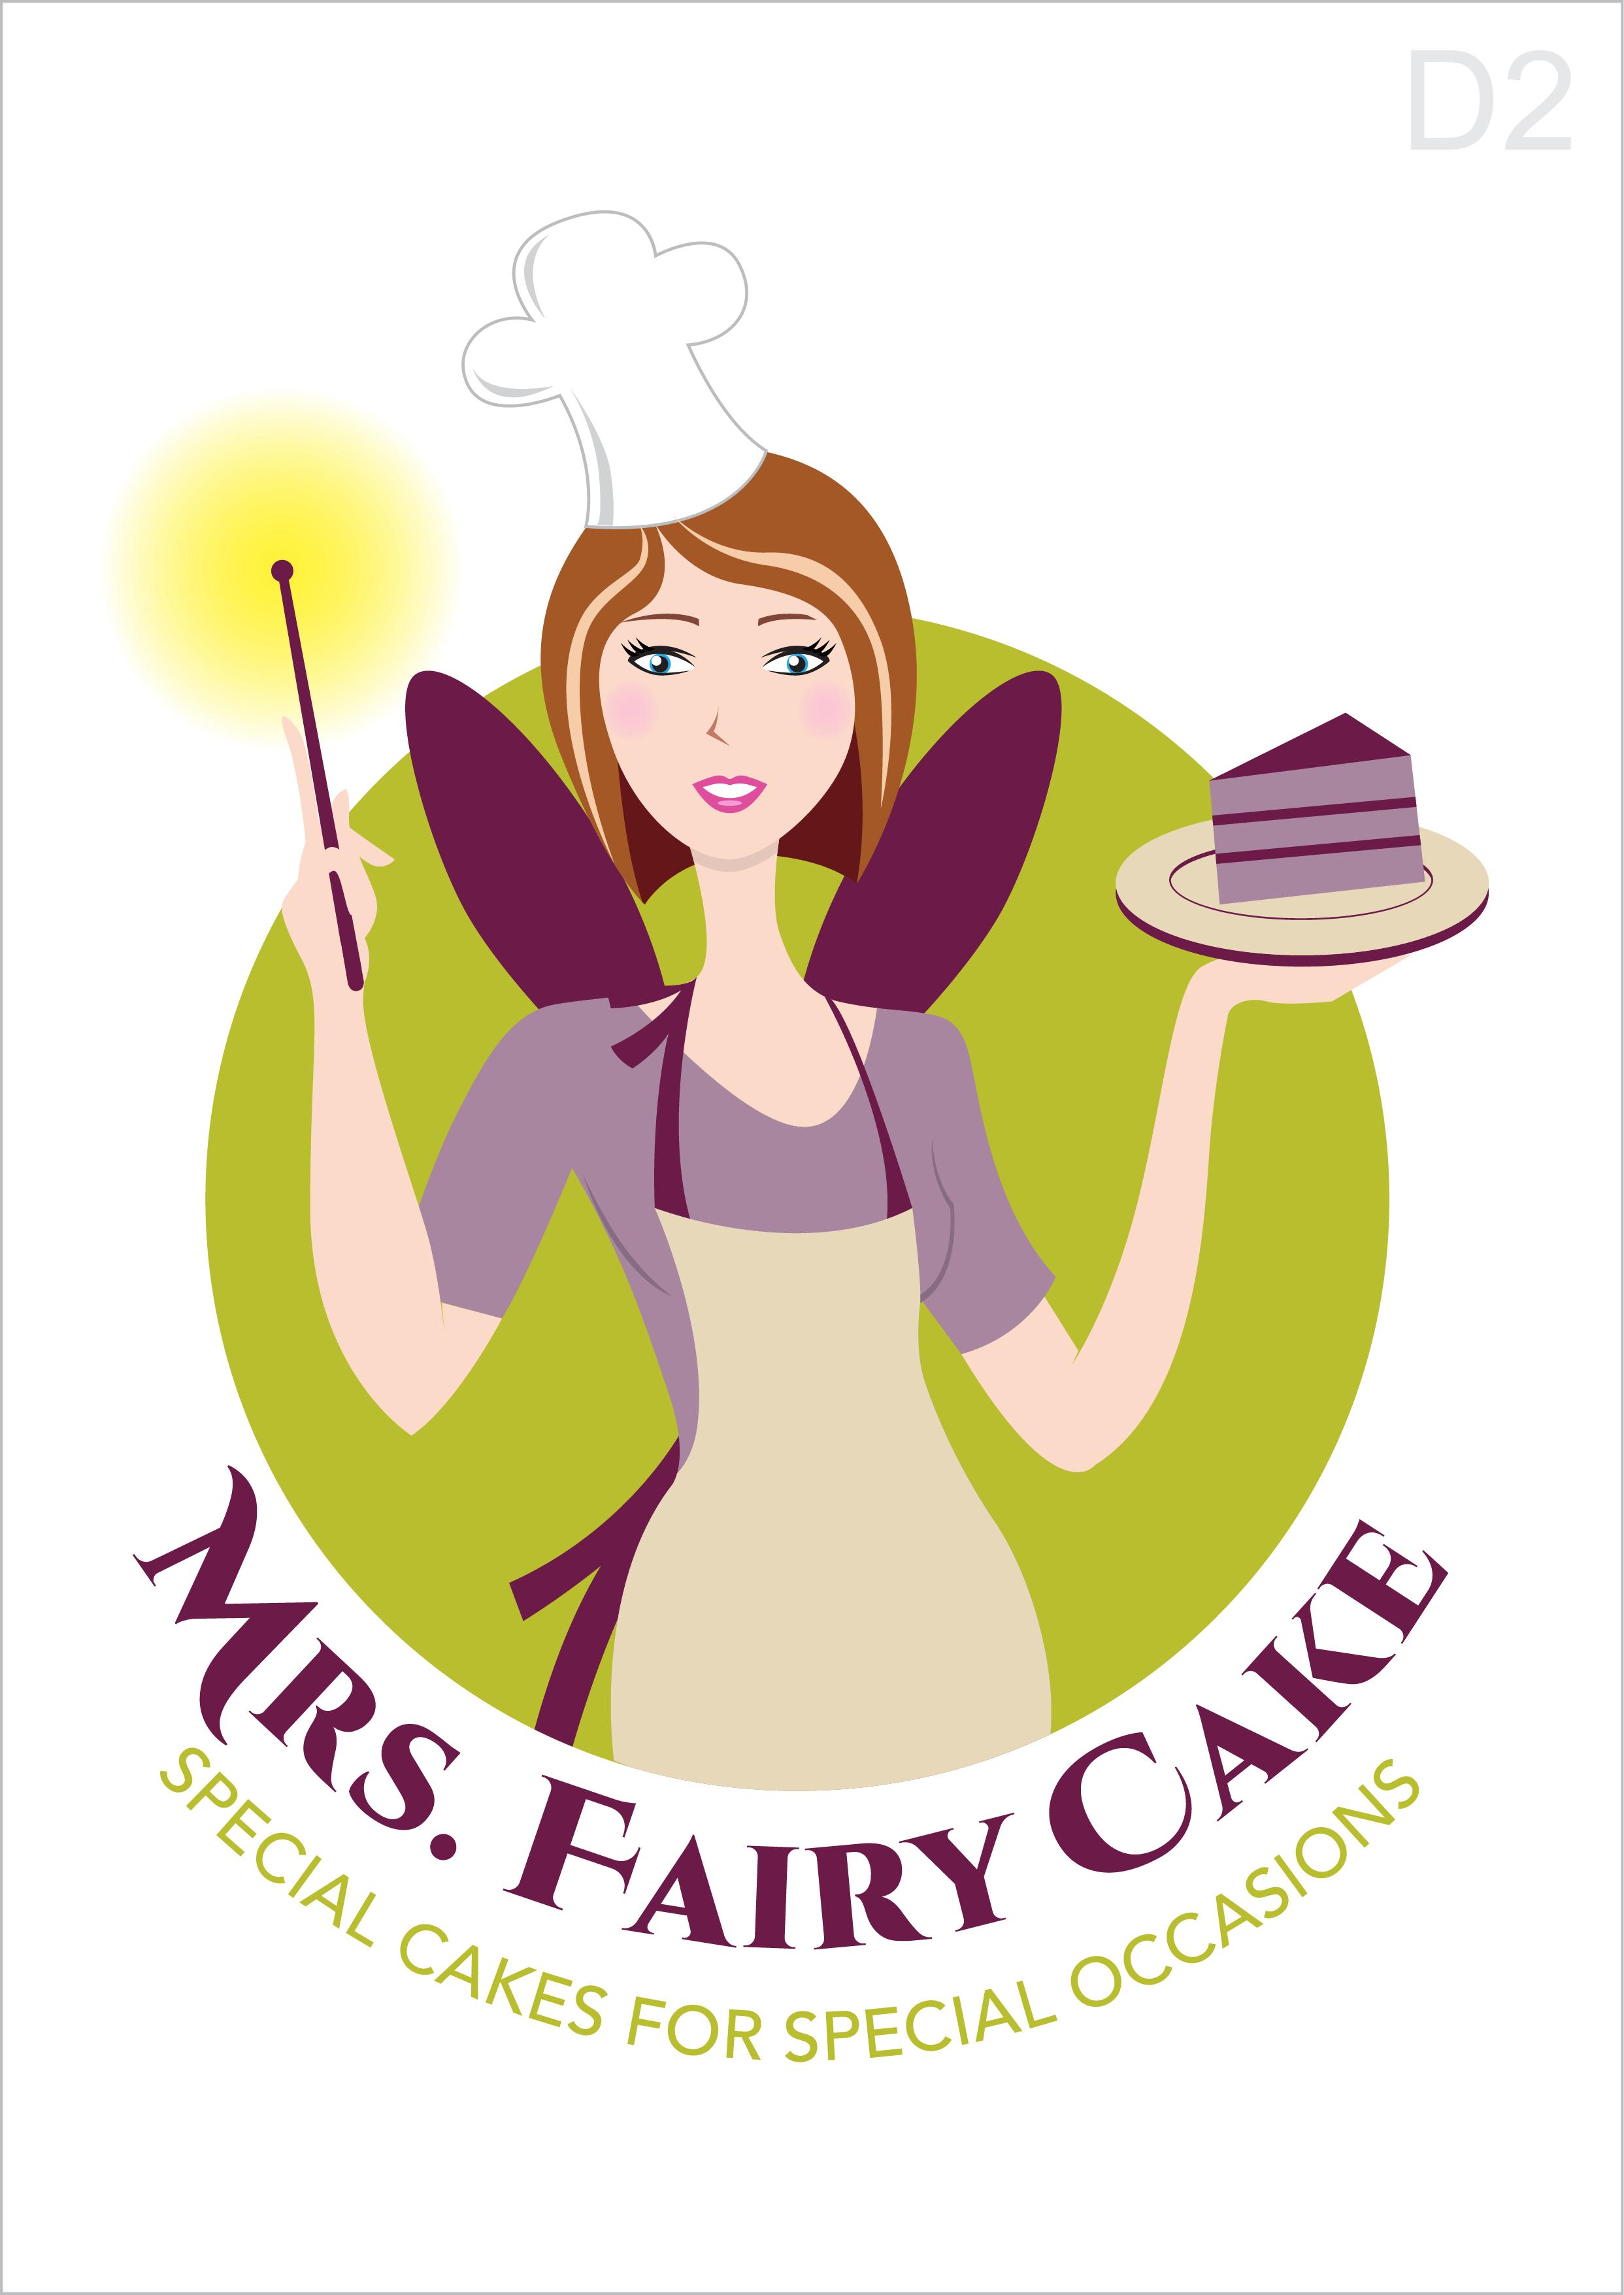 Mrs Fairy Cake logo2.png